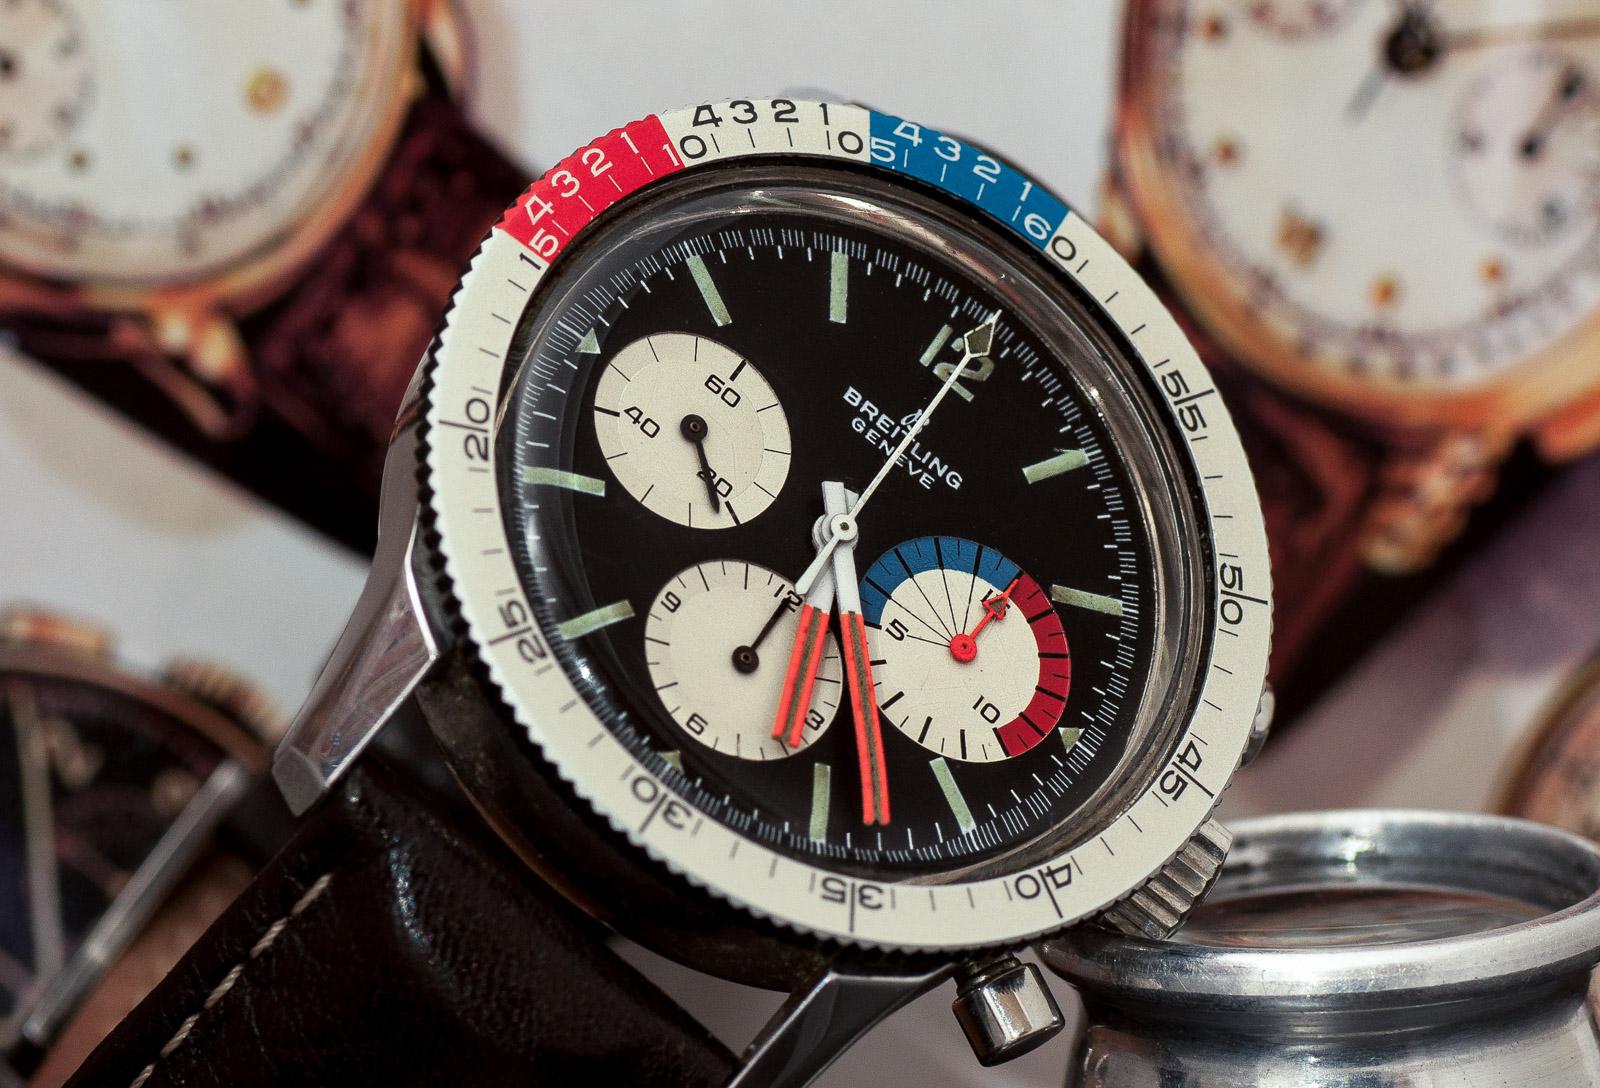 Breitling Co-pilot «Yachting», ref. 7650, Venus kaliber 178 (1969)